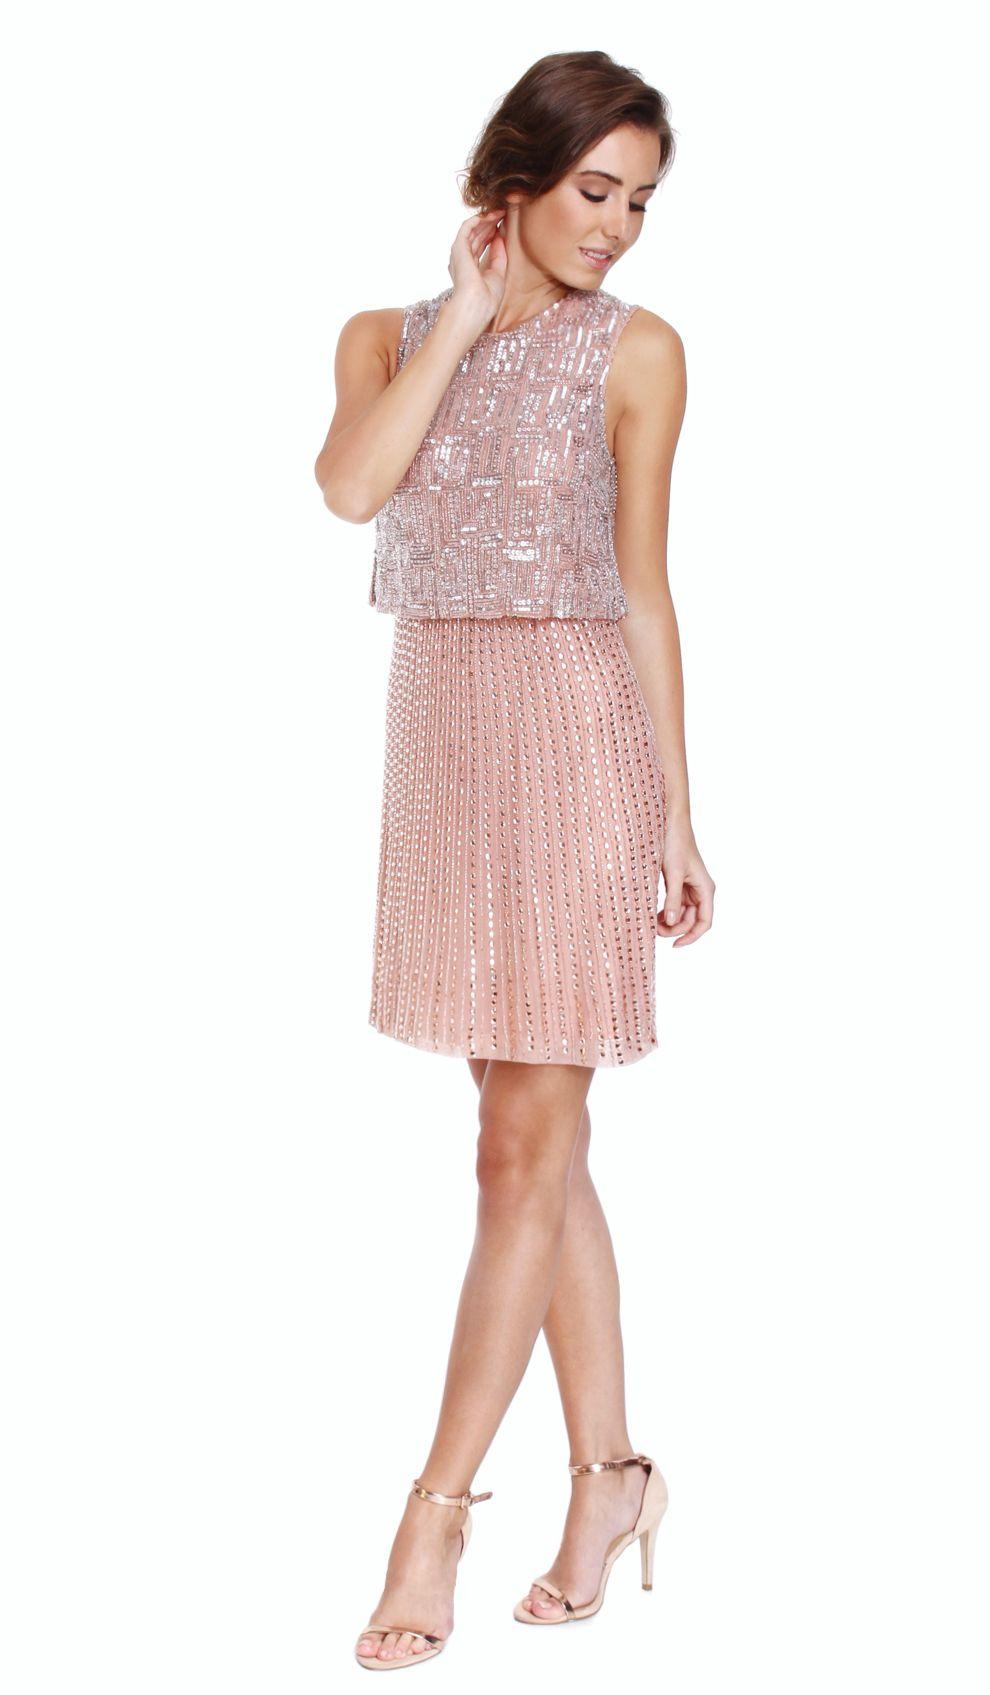 Rachel gilbert pink embellished mini dress chic by choice hire rachel gilbert pink embellished mini dress chic by choice hire designer dresses and evening ombrellifo Choice Image